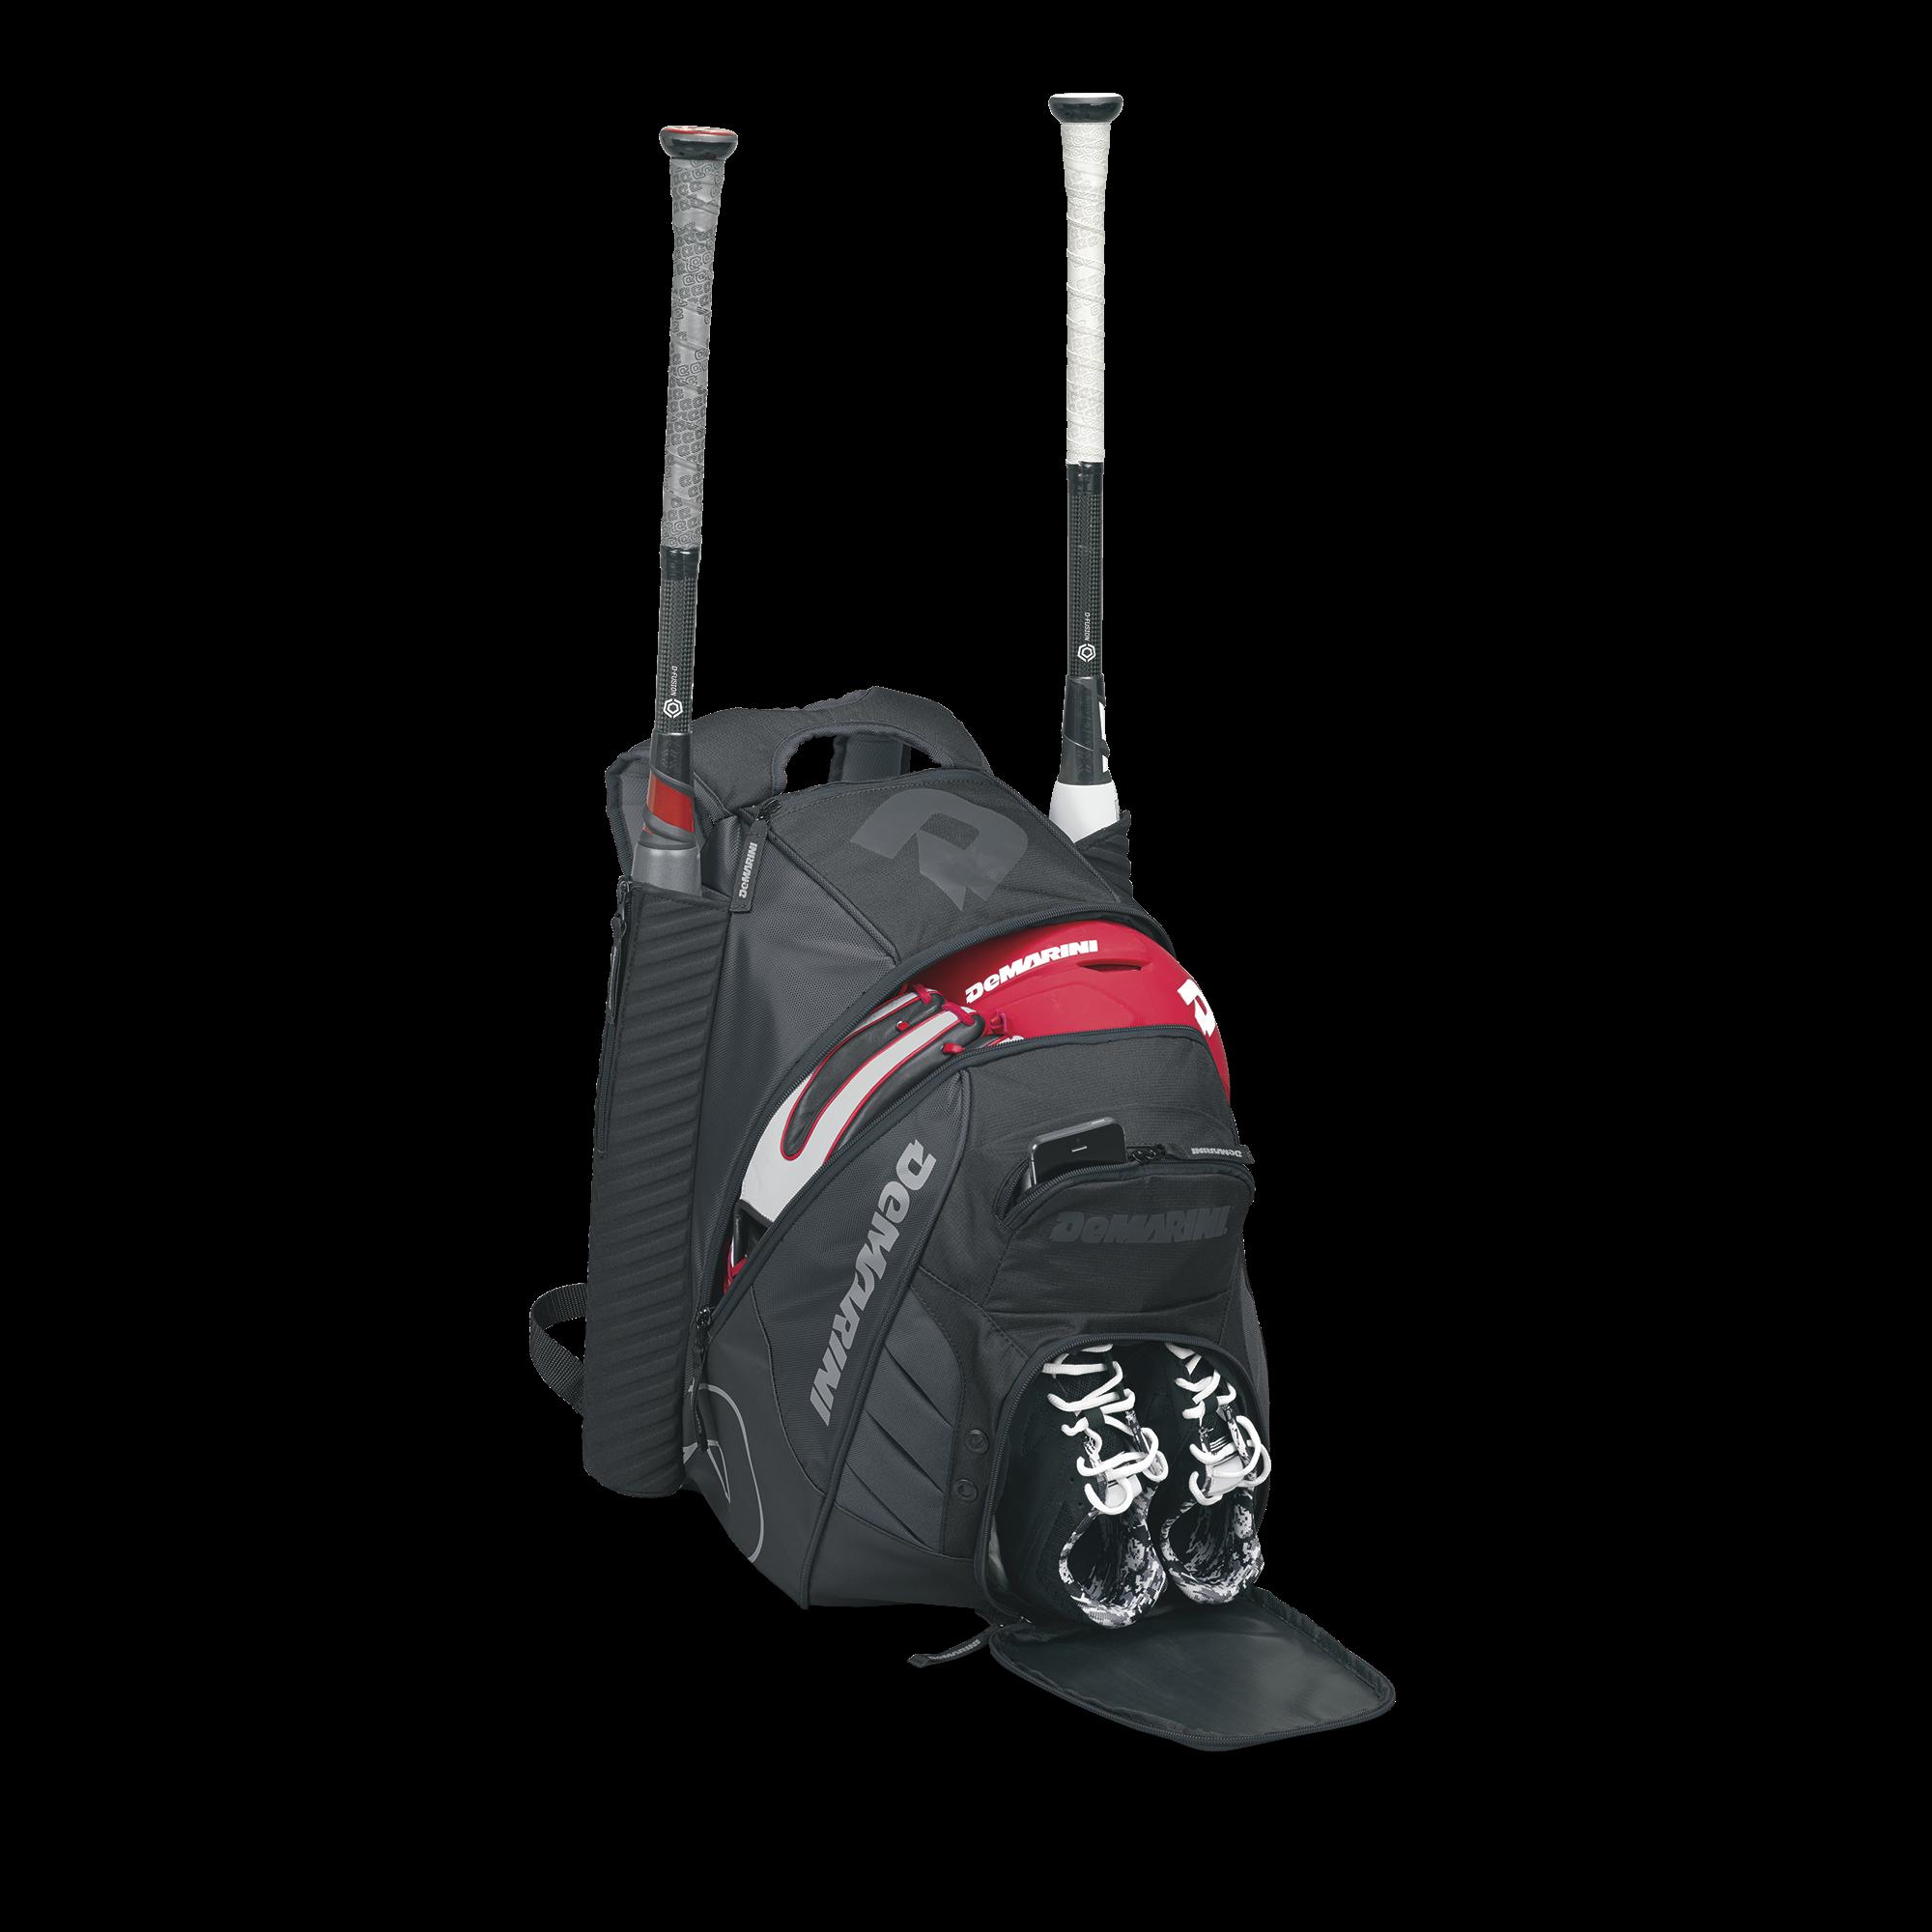 DeMarini VooDoo Rebirth Equipment Backpack WTD9105